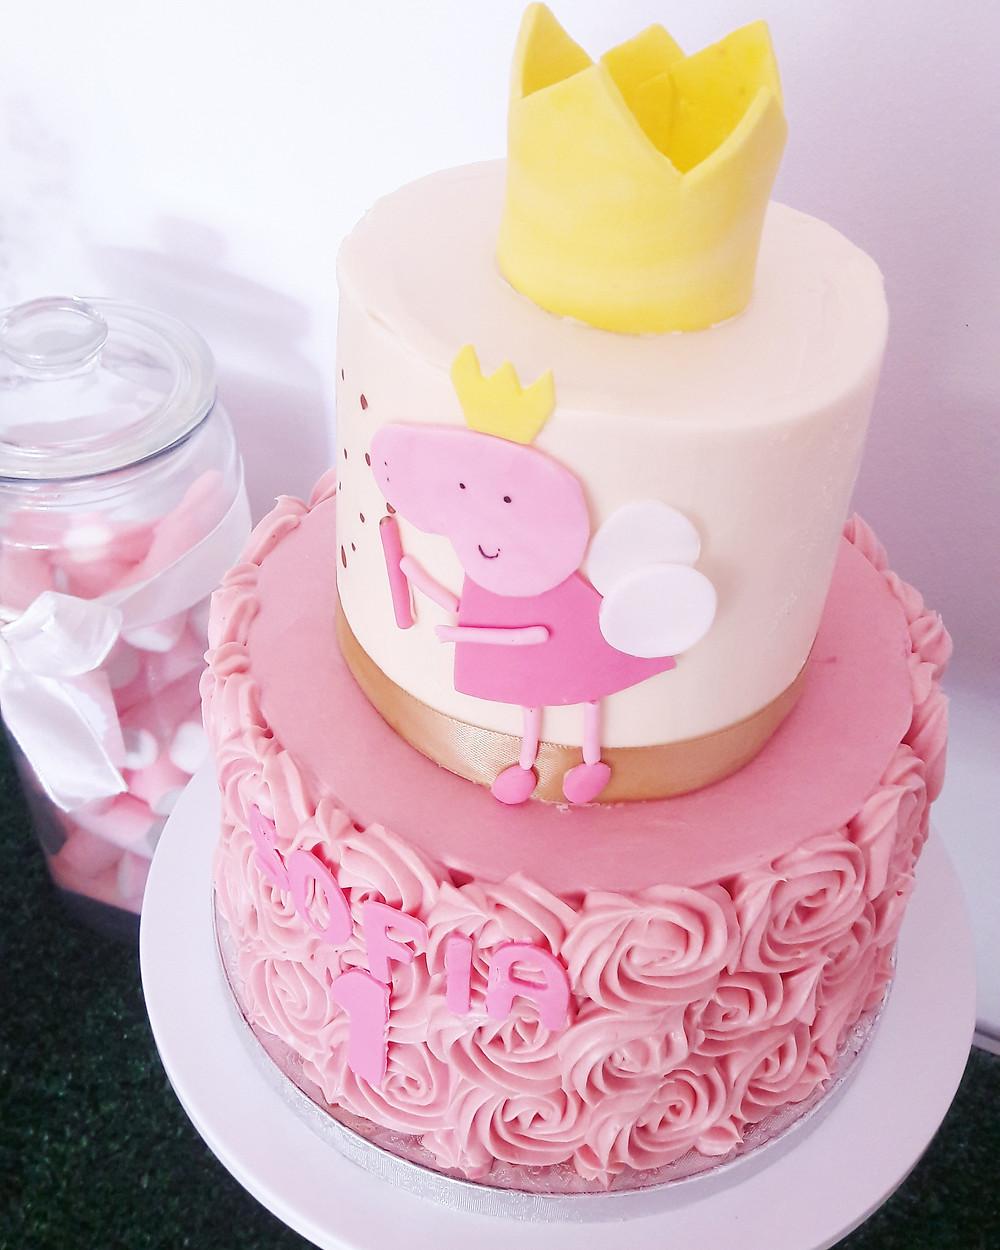 Tarta de cumpleaños, pastel de cumpleaños, peppa pig